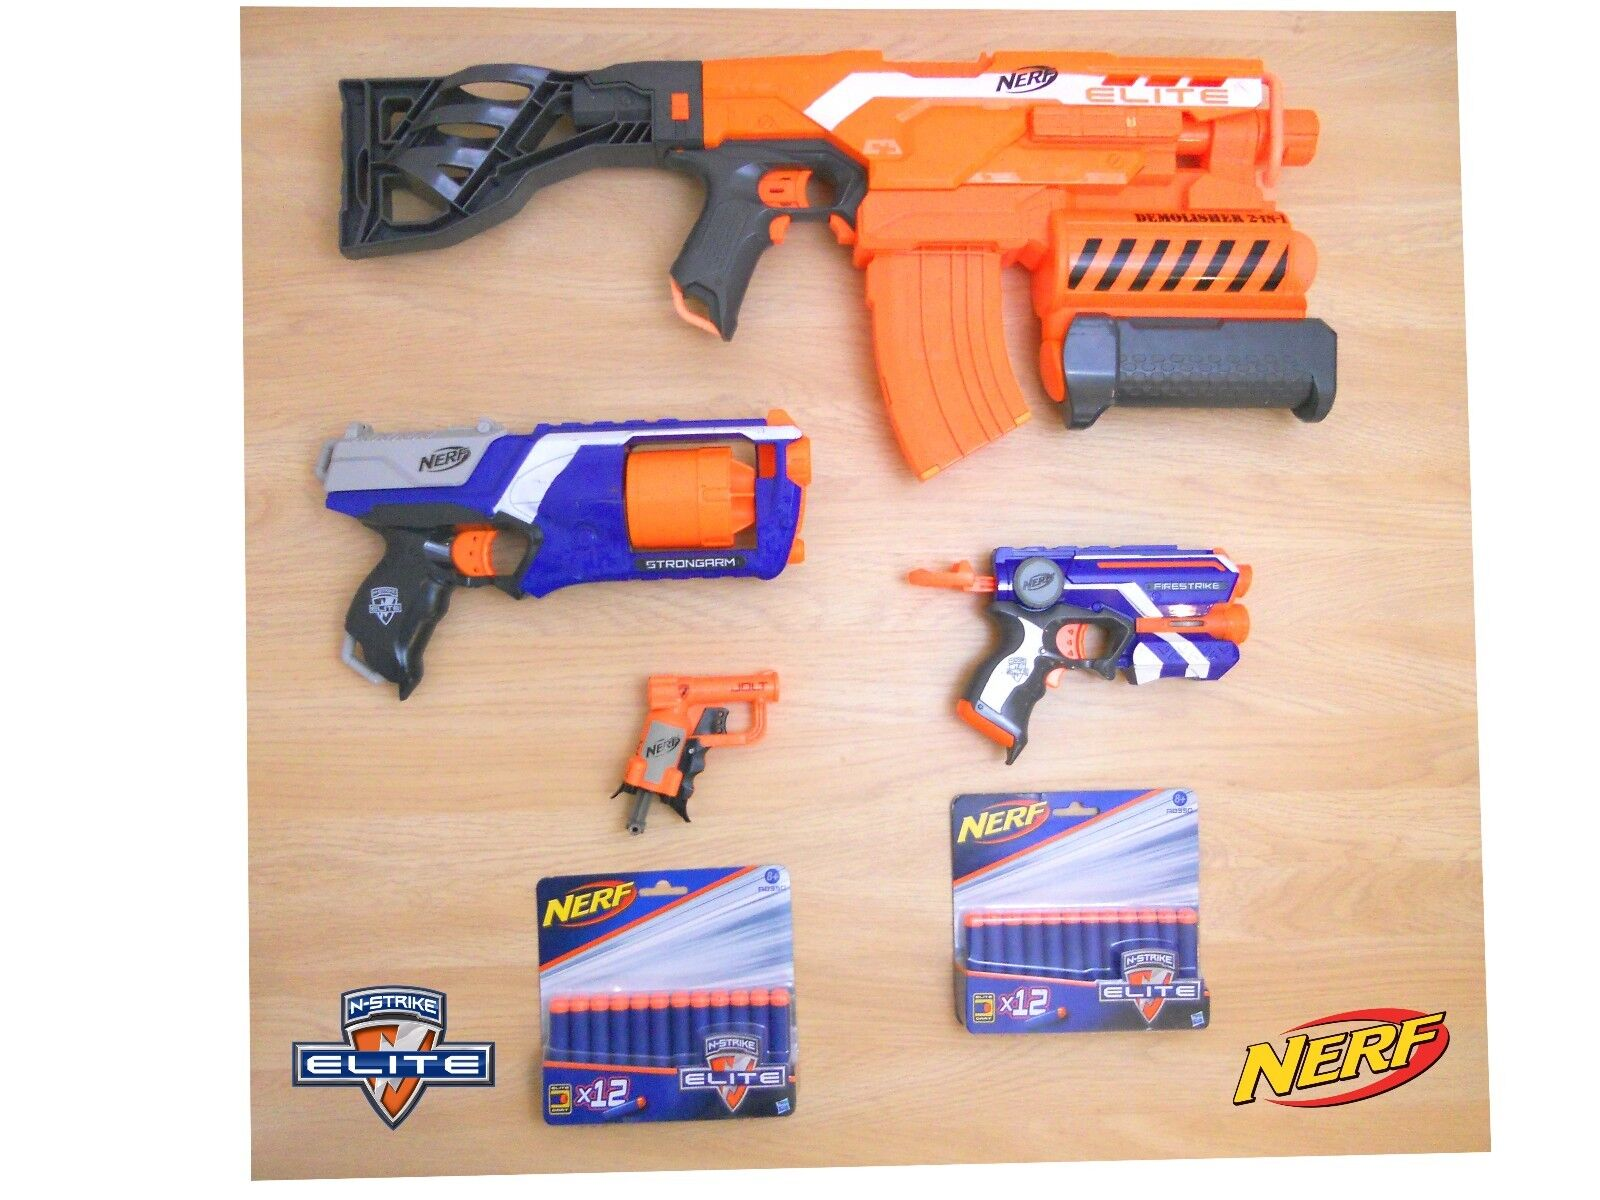 Pistolas Nerf Paquete demoledor Strongarm Firestrike Jolt & 24 N-strike Elite Dardos